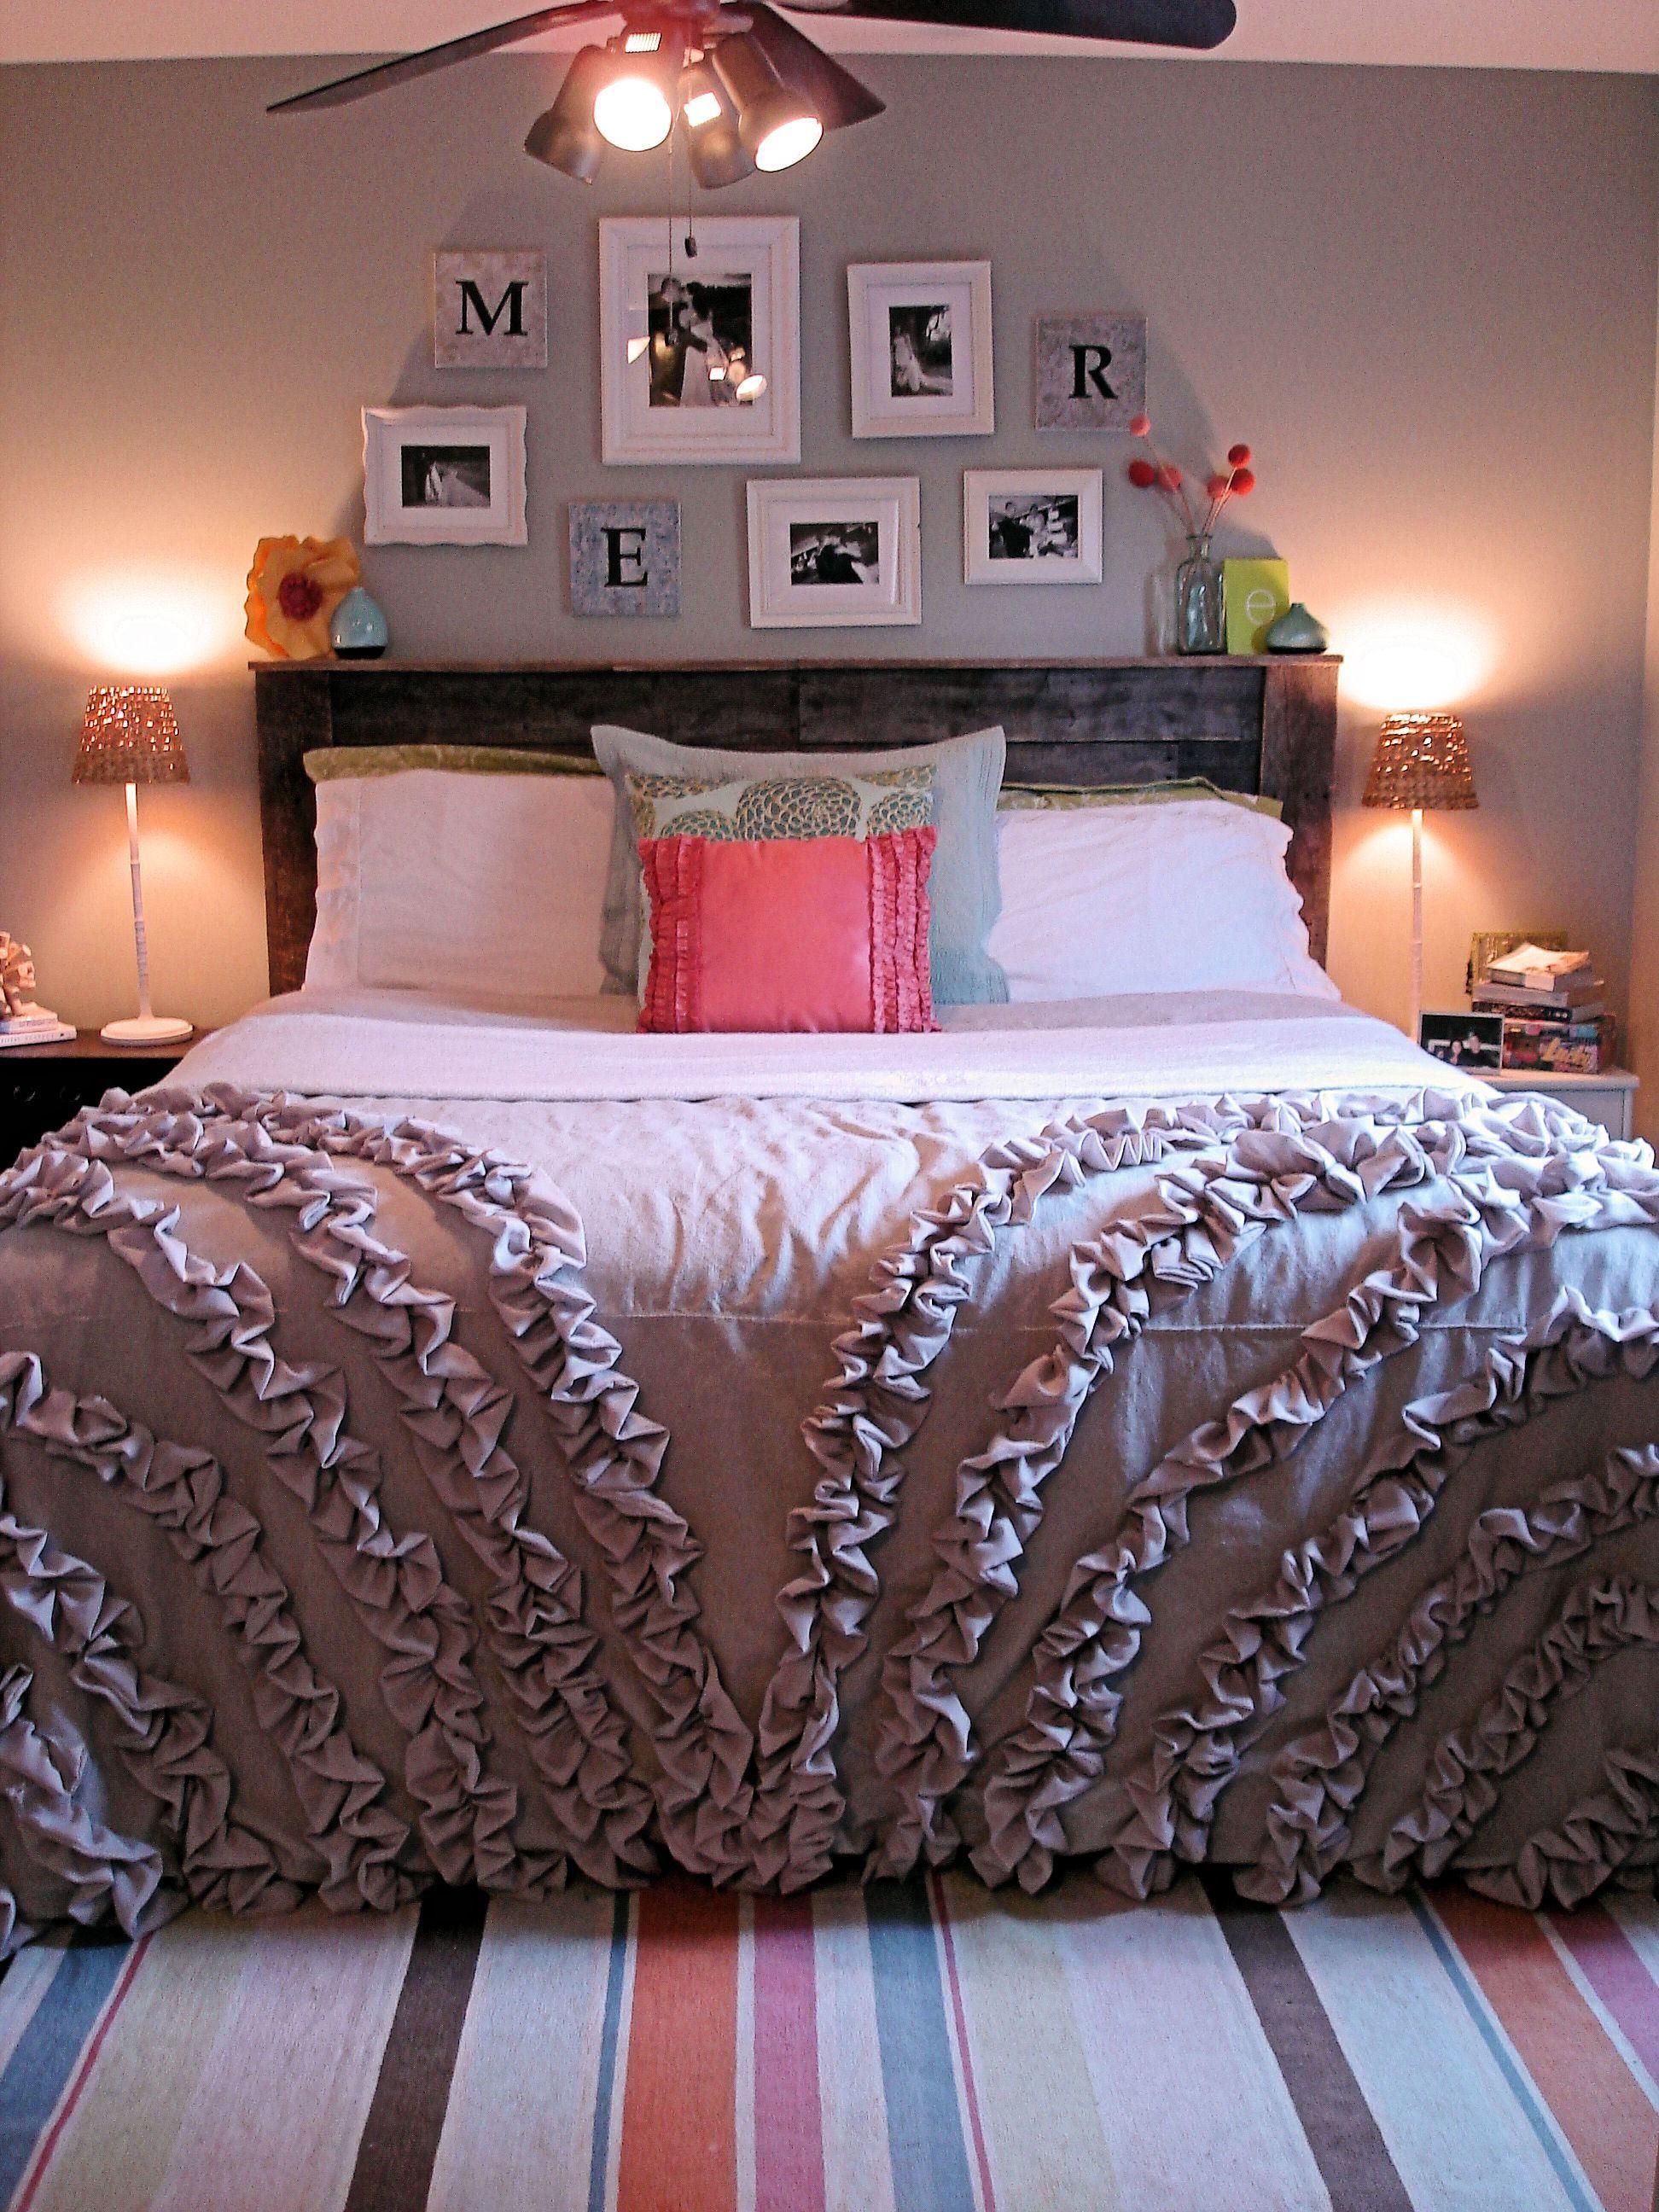 Introductions The Ruffle Duvet Ruffle duvet, Bedroom